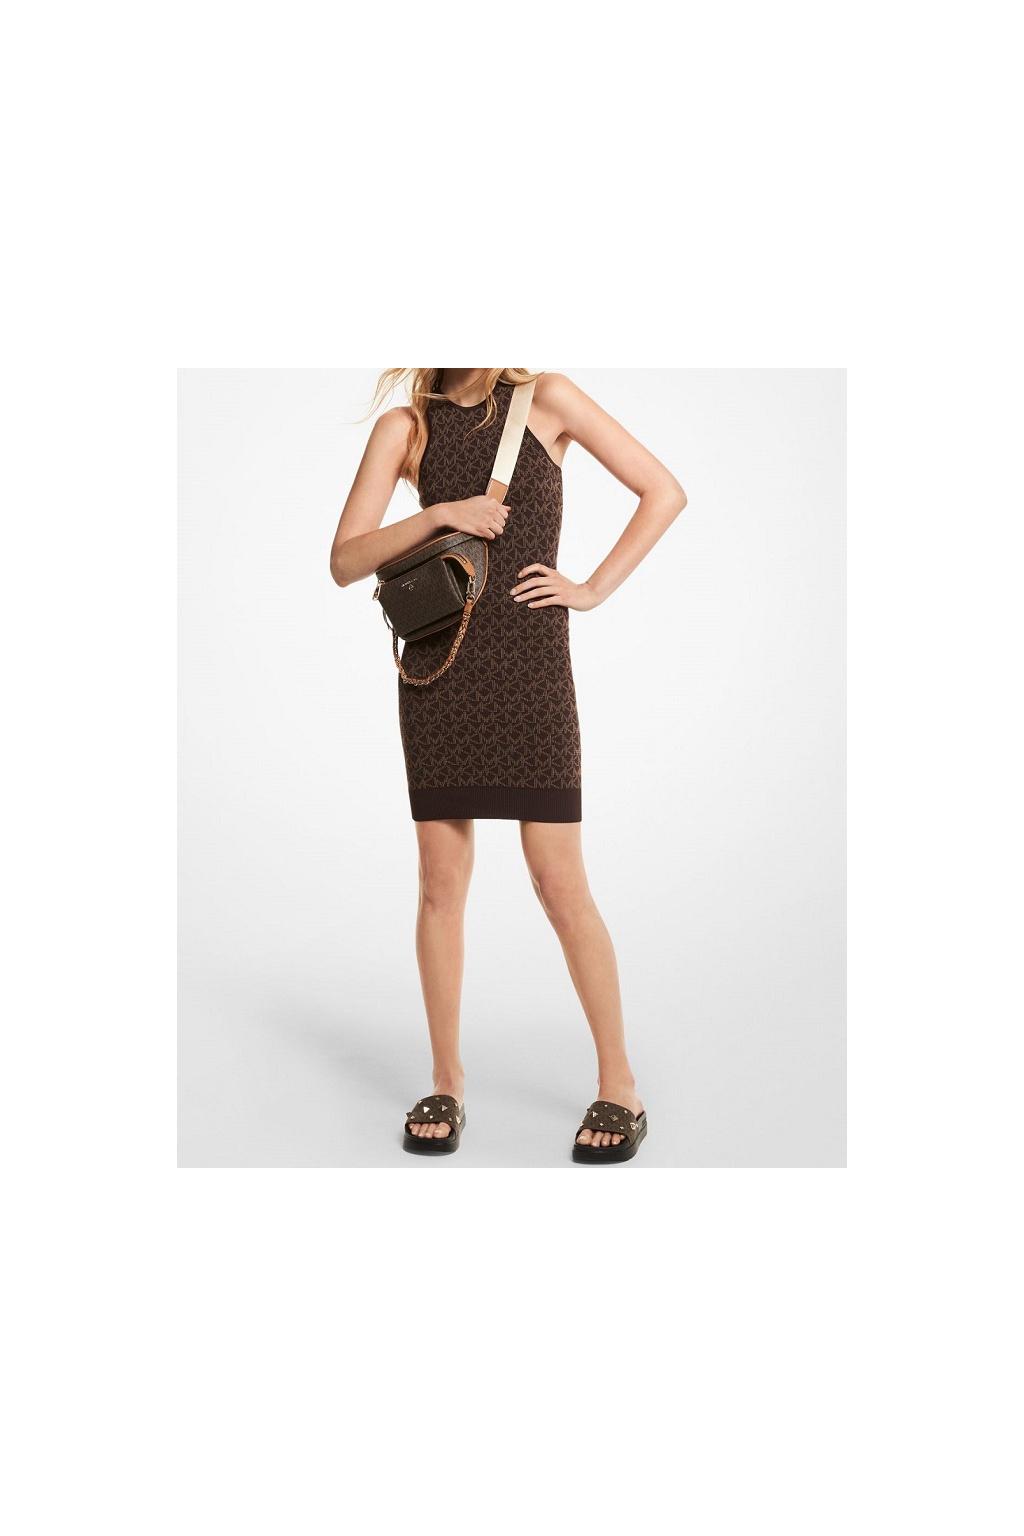 Dámské šaty Michael Kors MU1807G2RW hnědé